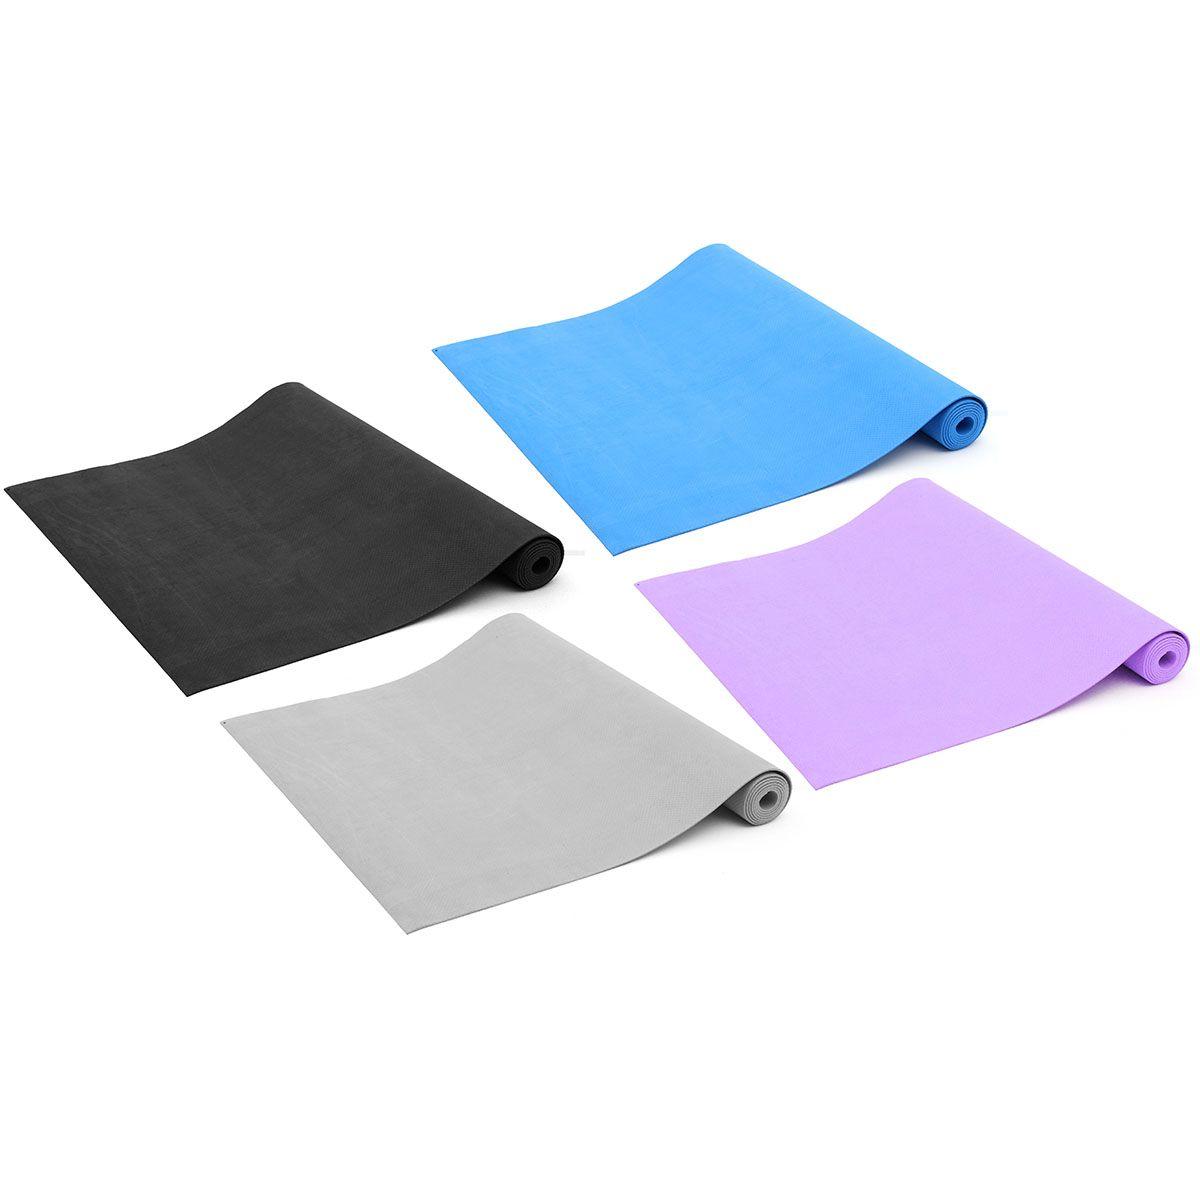 2017 Wholesale 3mm Thickness Fitness Non Slip Yoga Mats